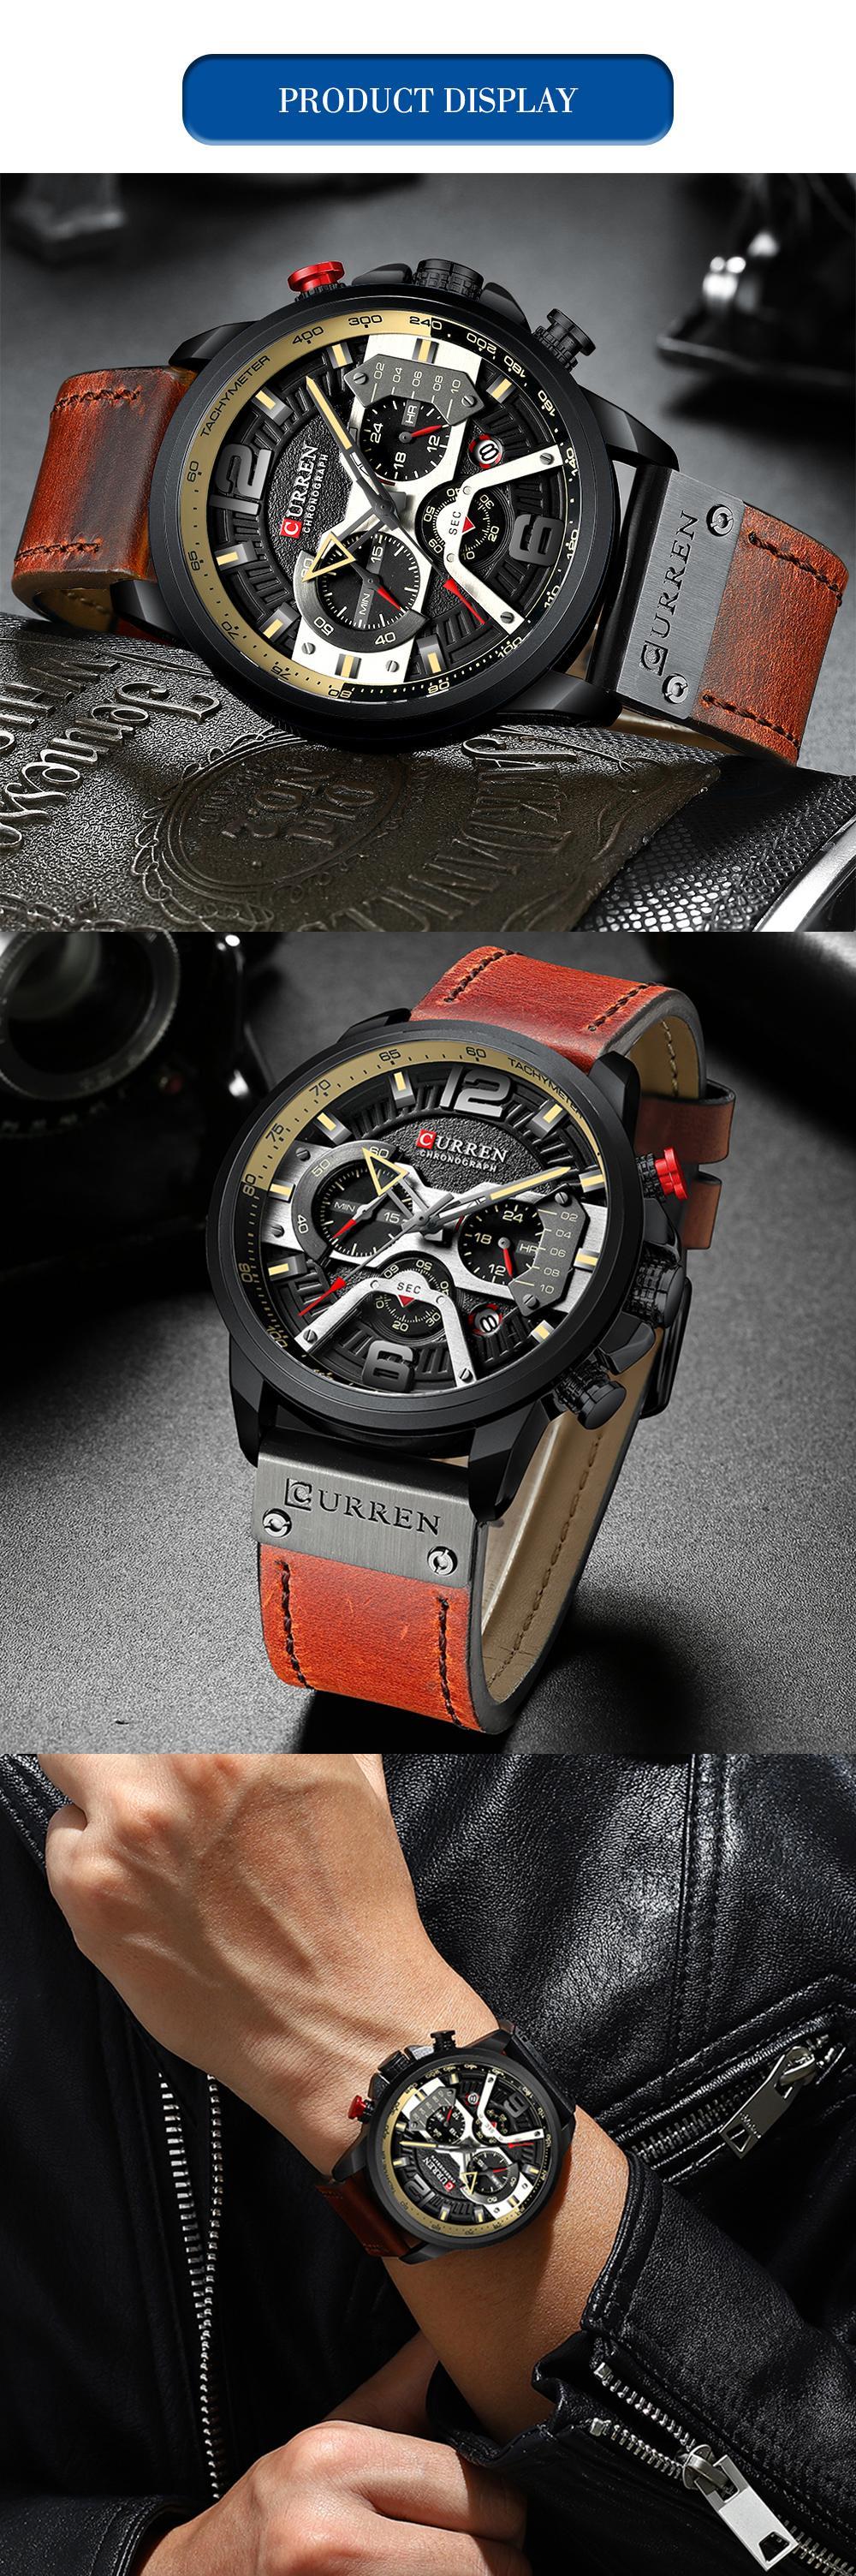 HTB1RVQbLNjaK1RjSZFAq6zdLFXai CURREN Relogio Masculino Sport Watch Men Top Brand Luxury Quartz Men's Chronograph Date Military Wrist Watches Waterproof 8329